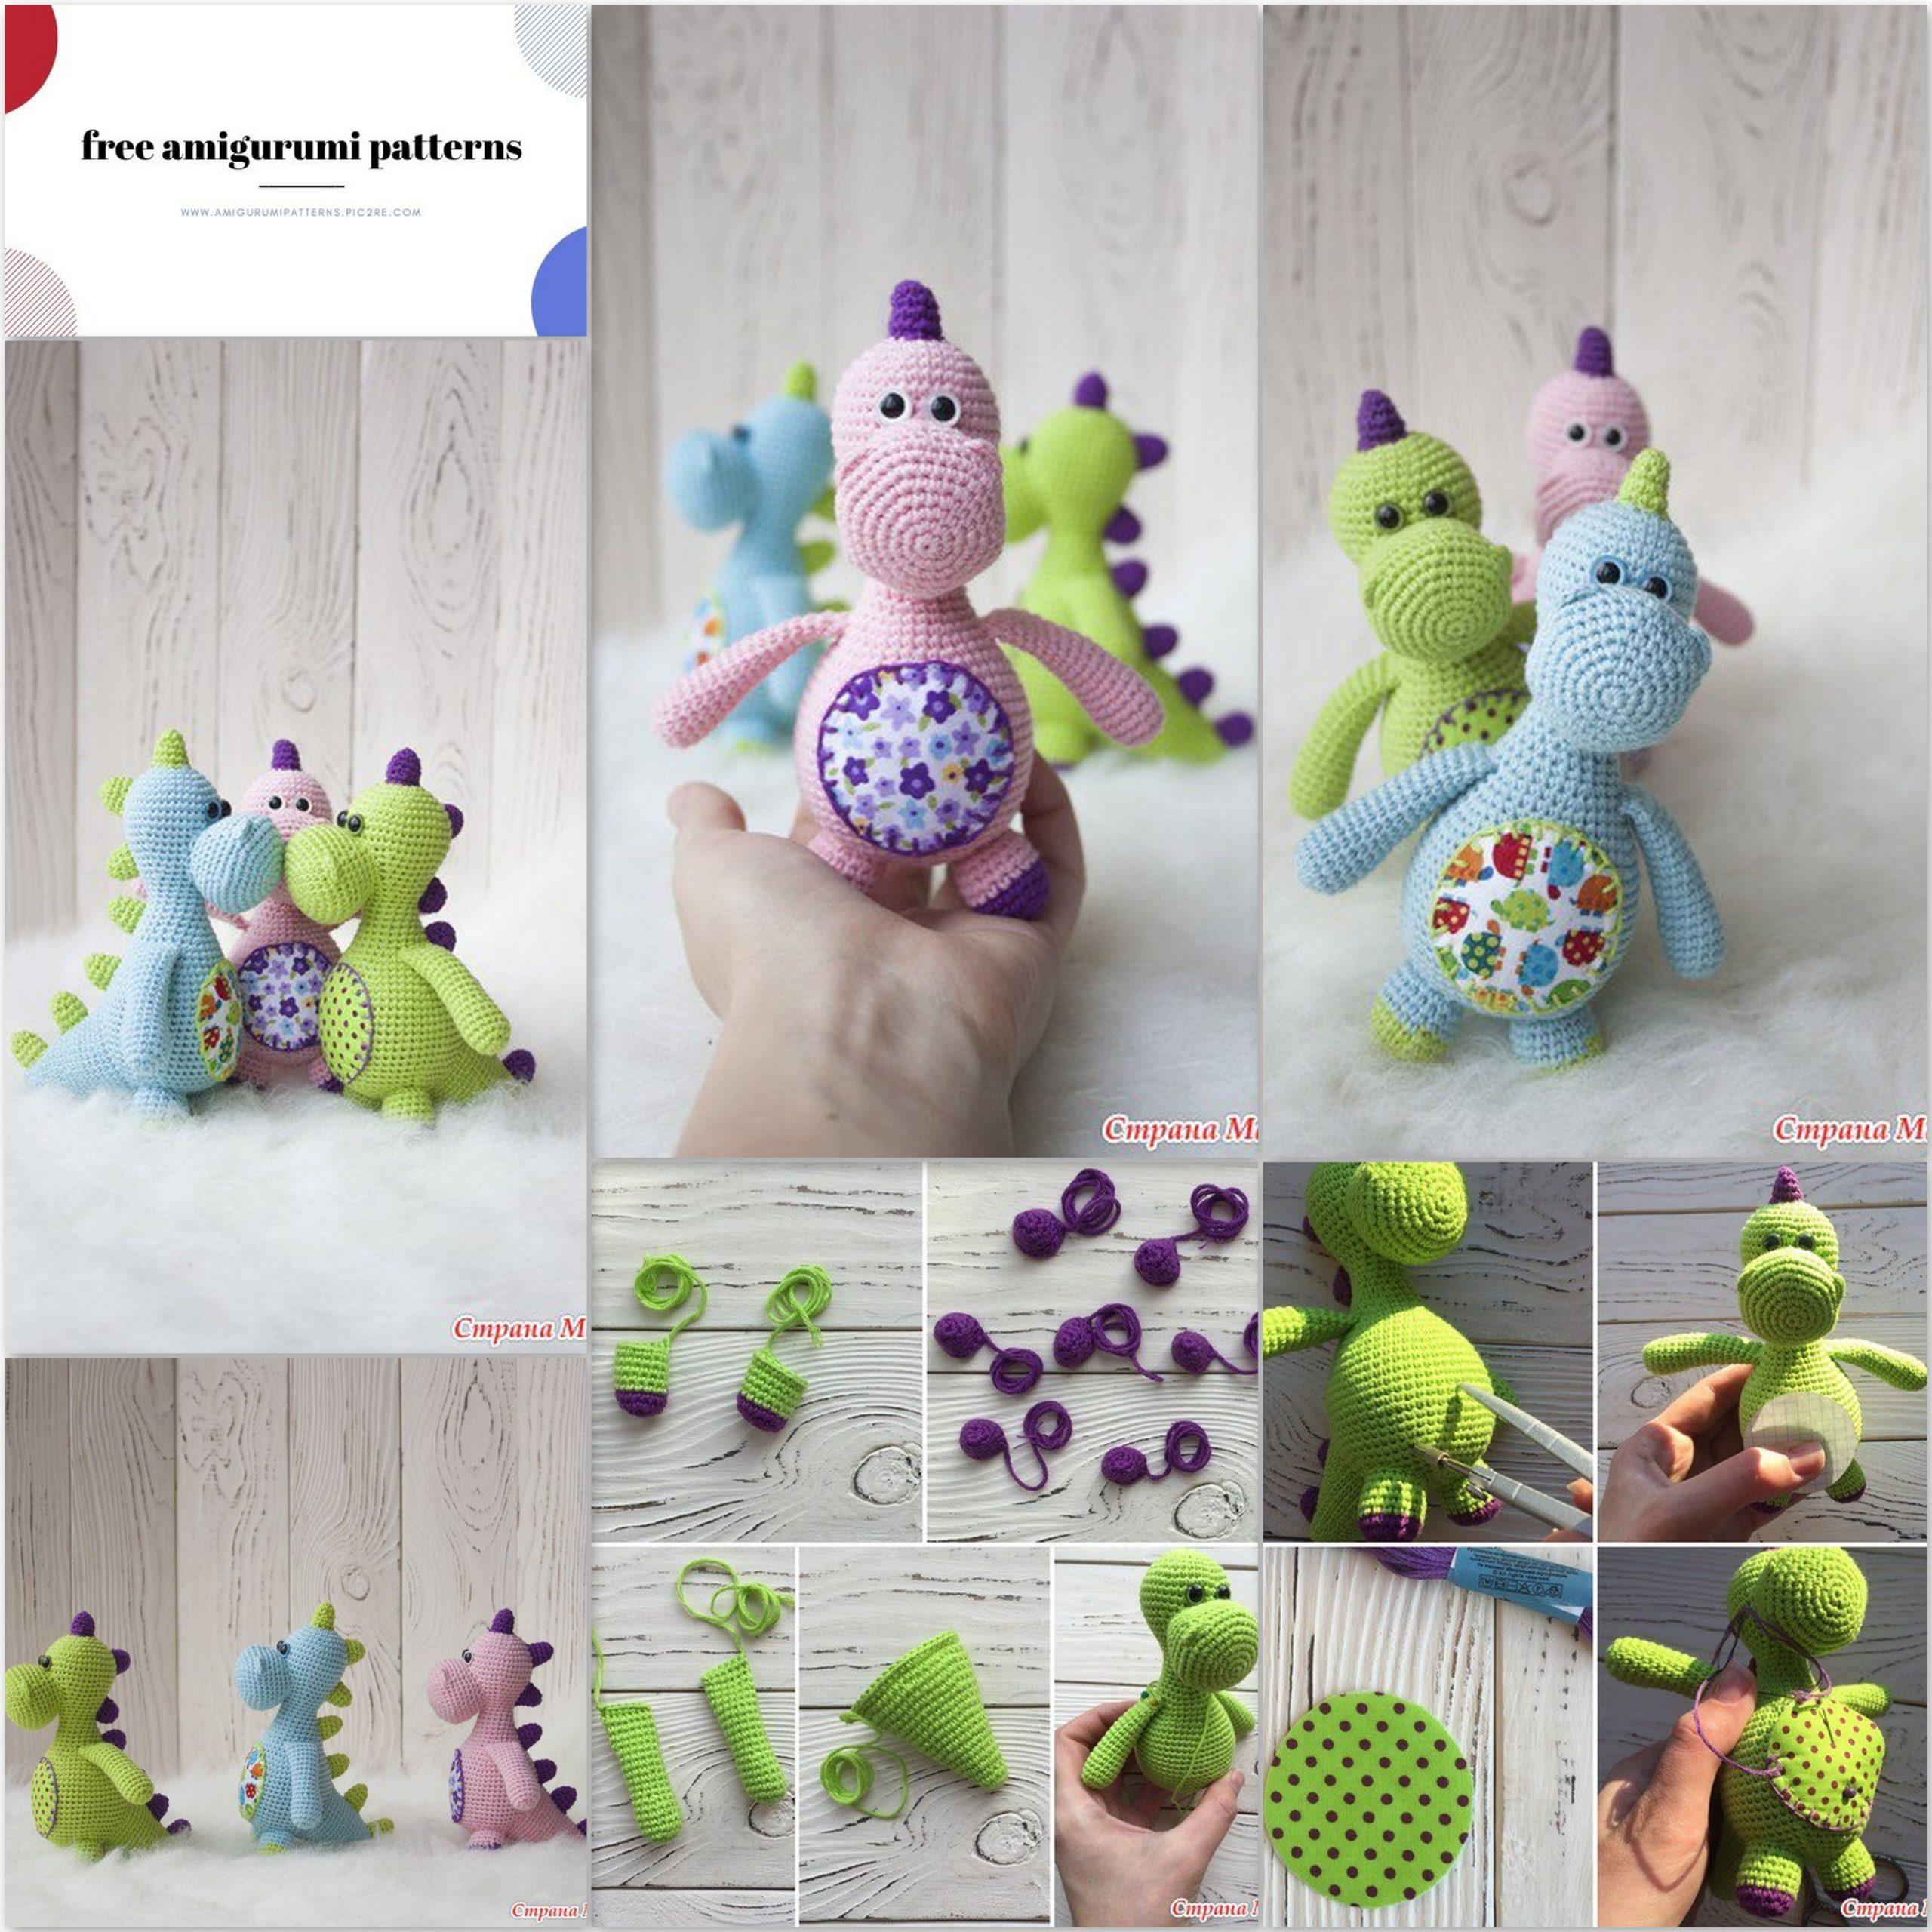 Tiny dragon amigurumi pattern | Crochet dragon pattern, Crochet ... | 2560x2560